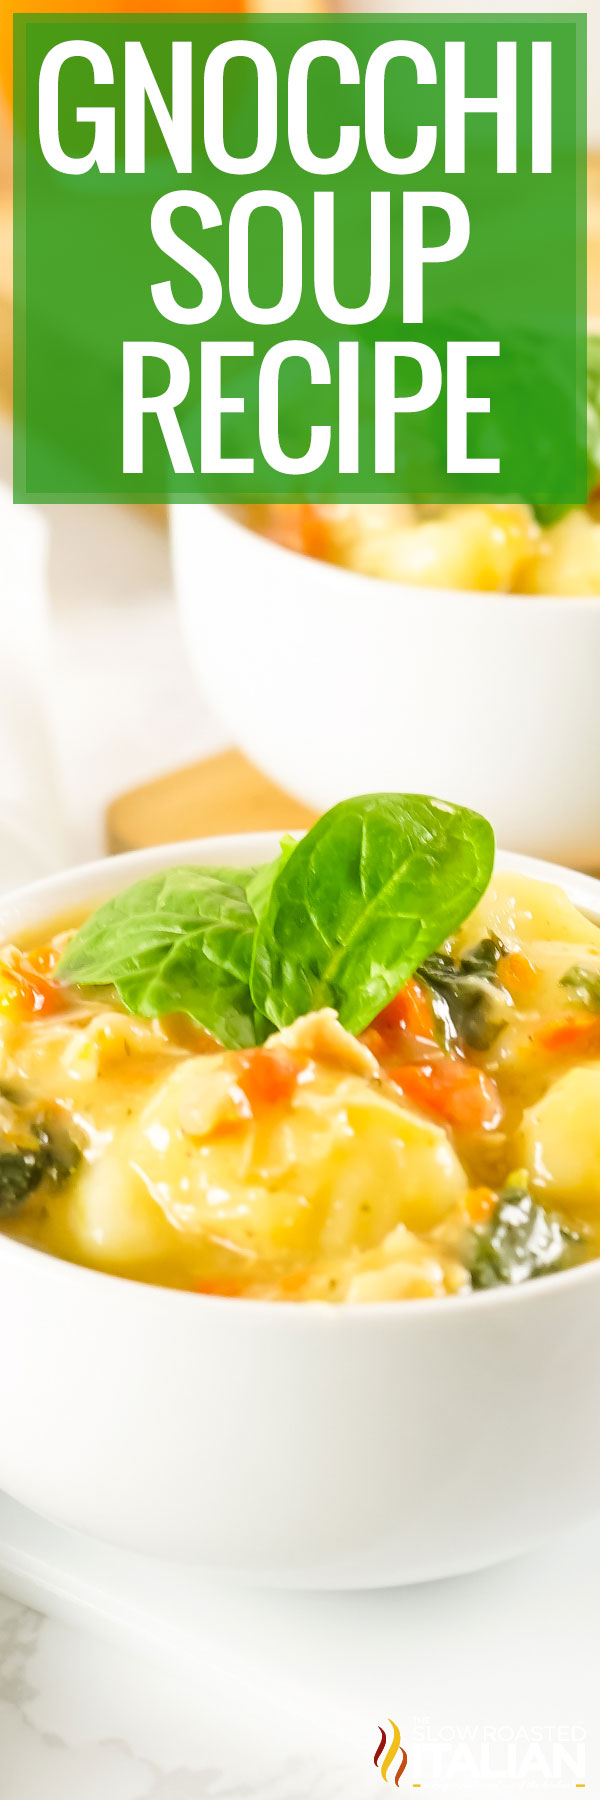 Gnocchi Soup Recipe closeup